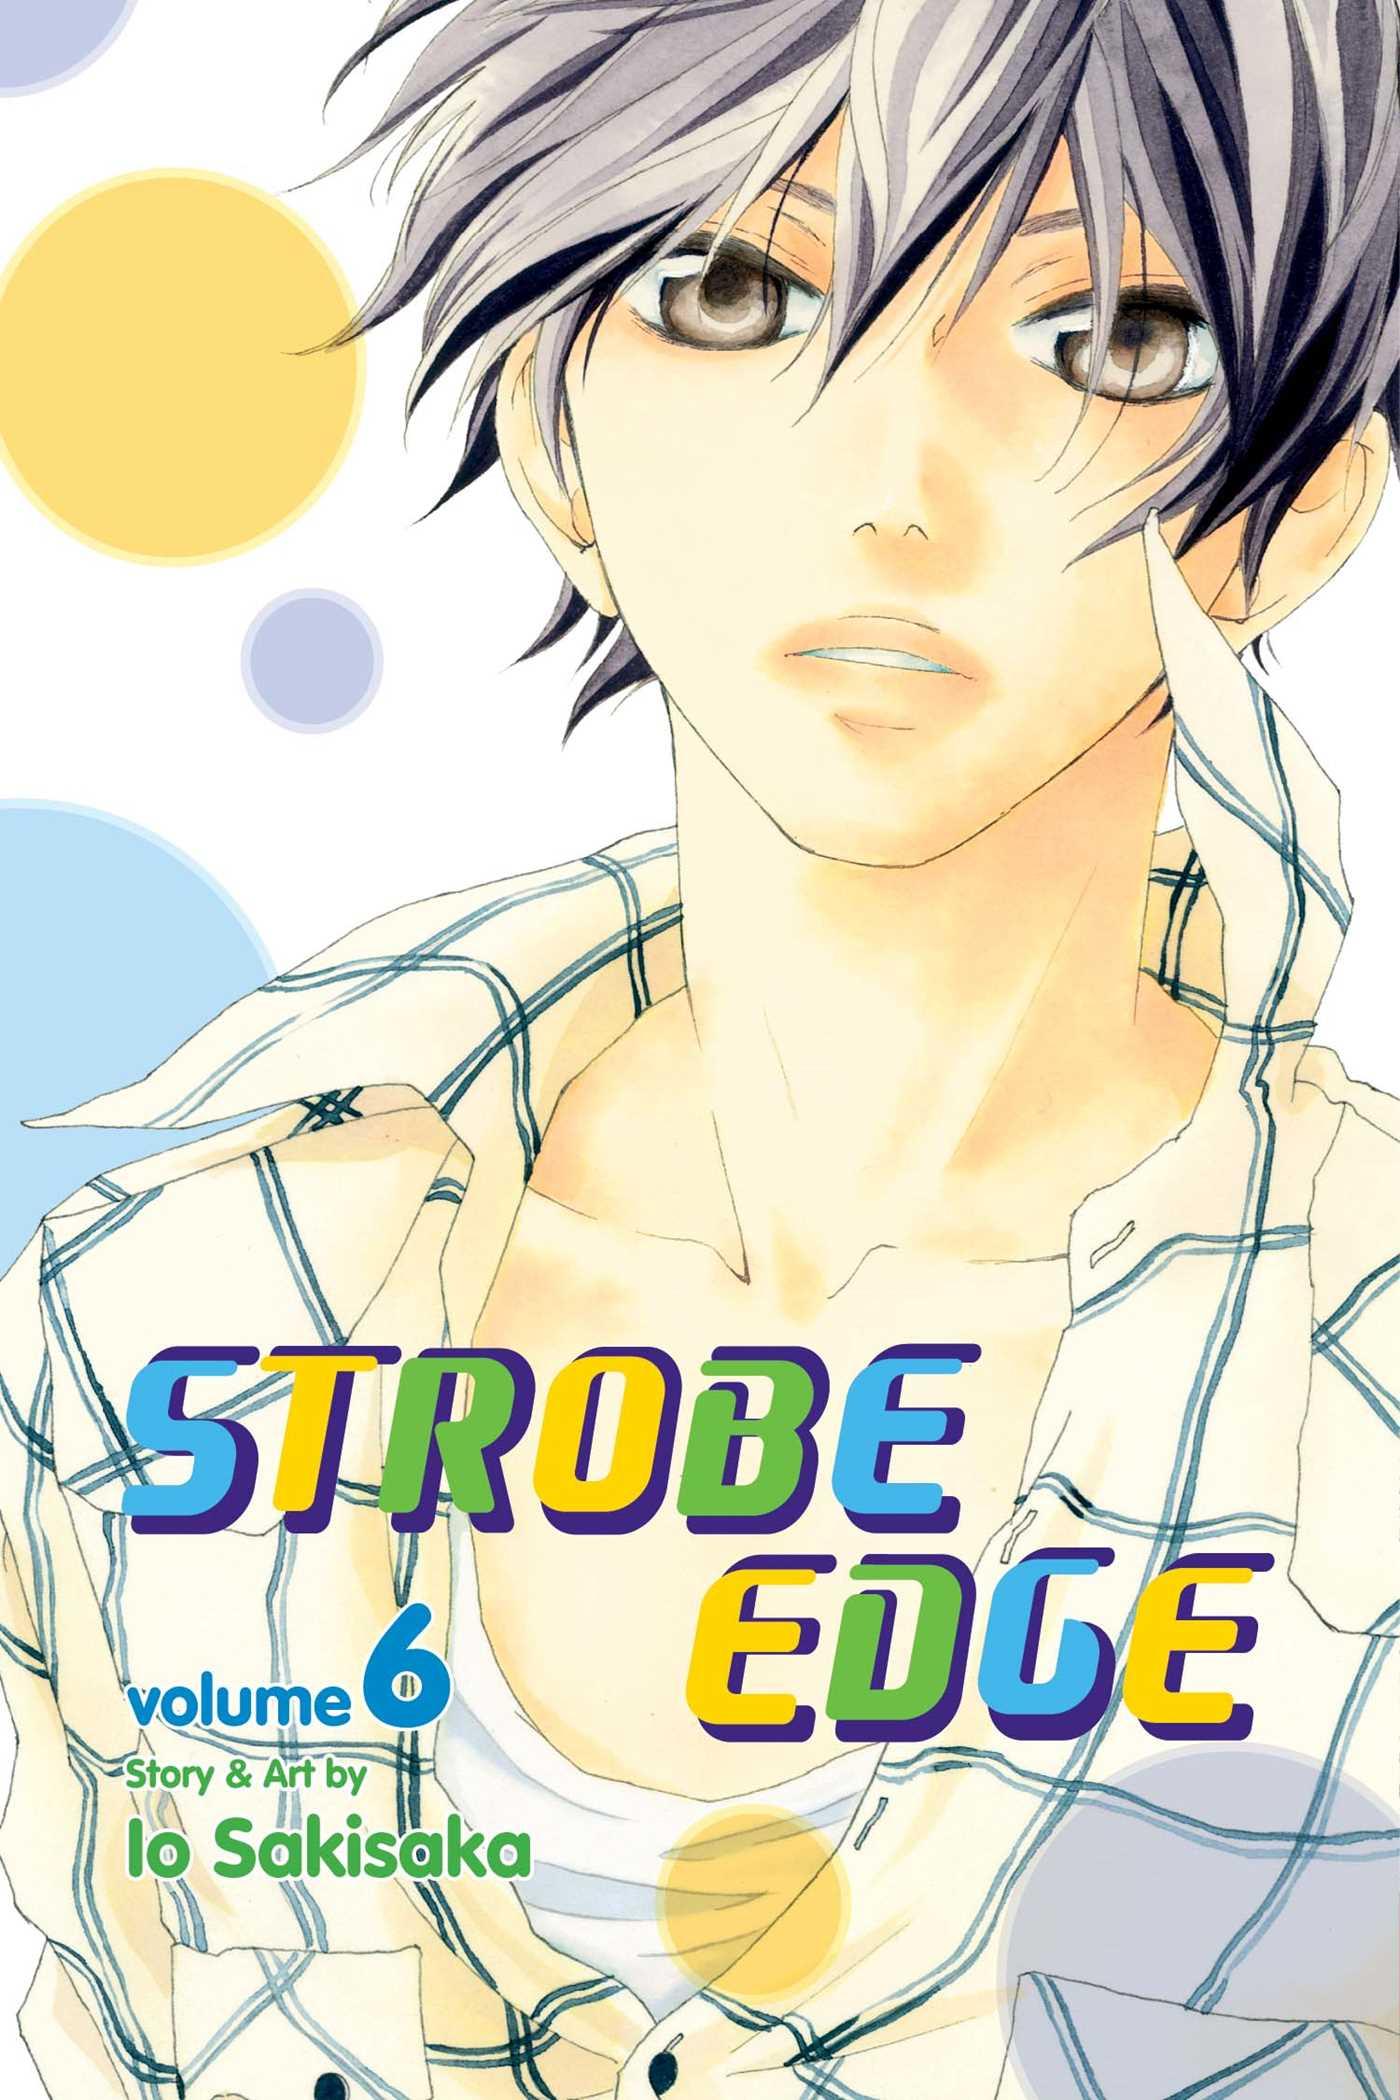 Strobe edge vol 6 9781421553146 hr